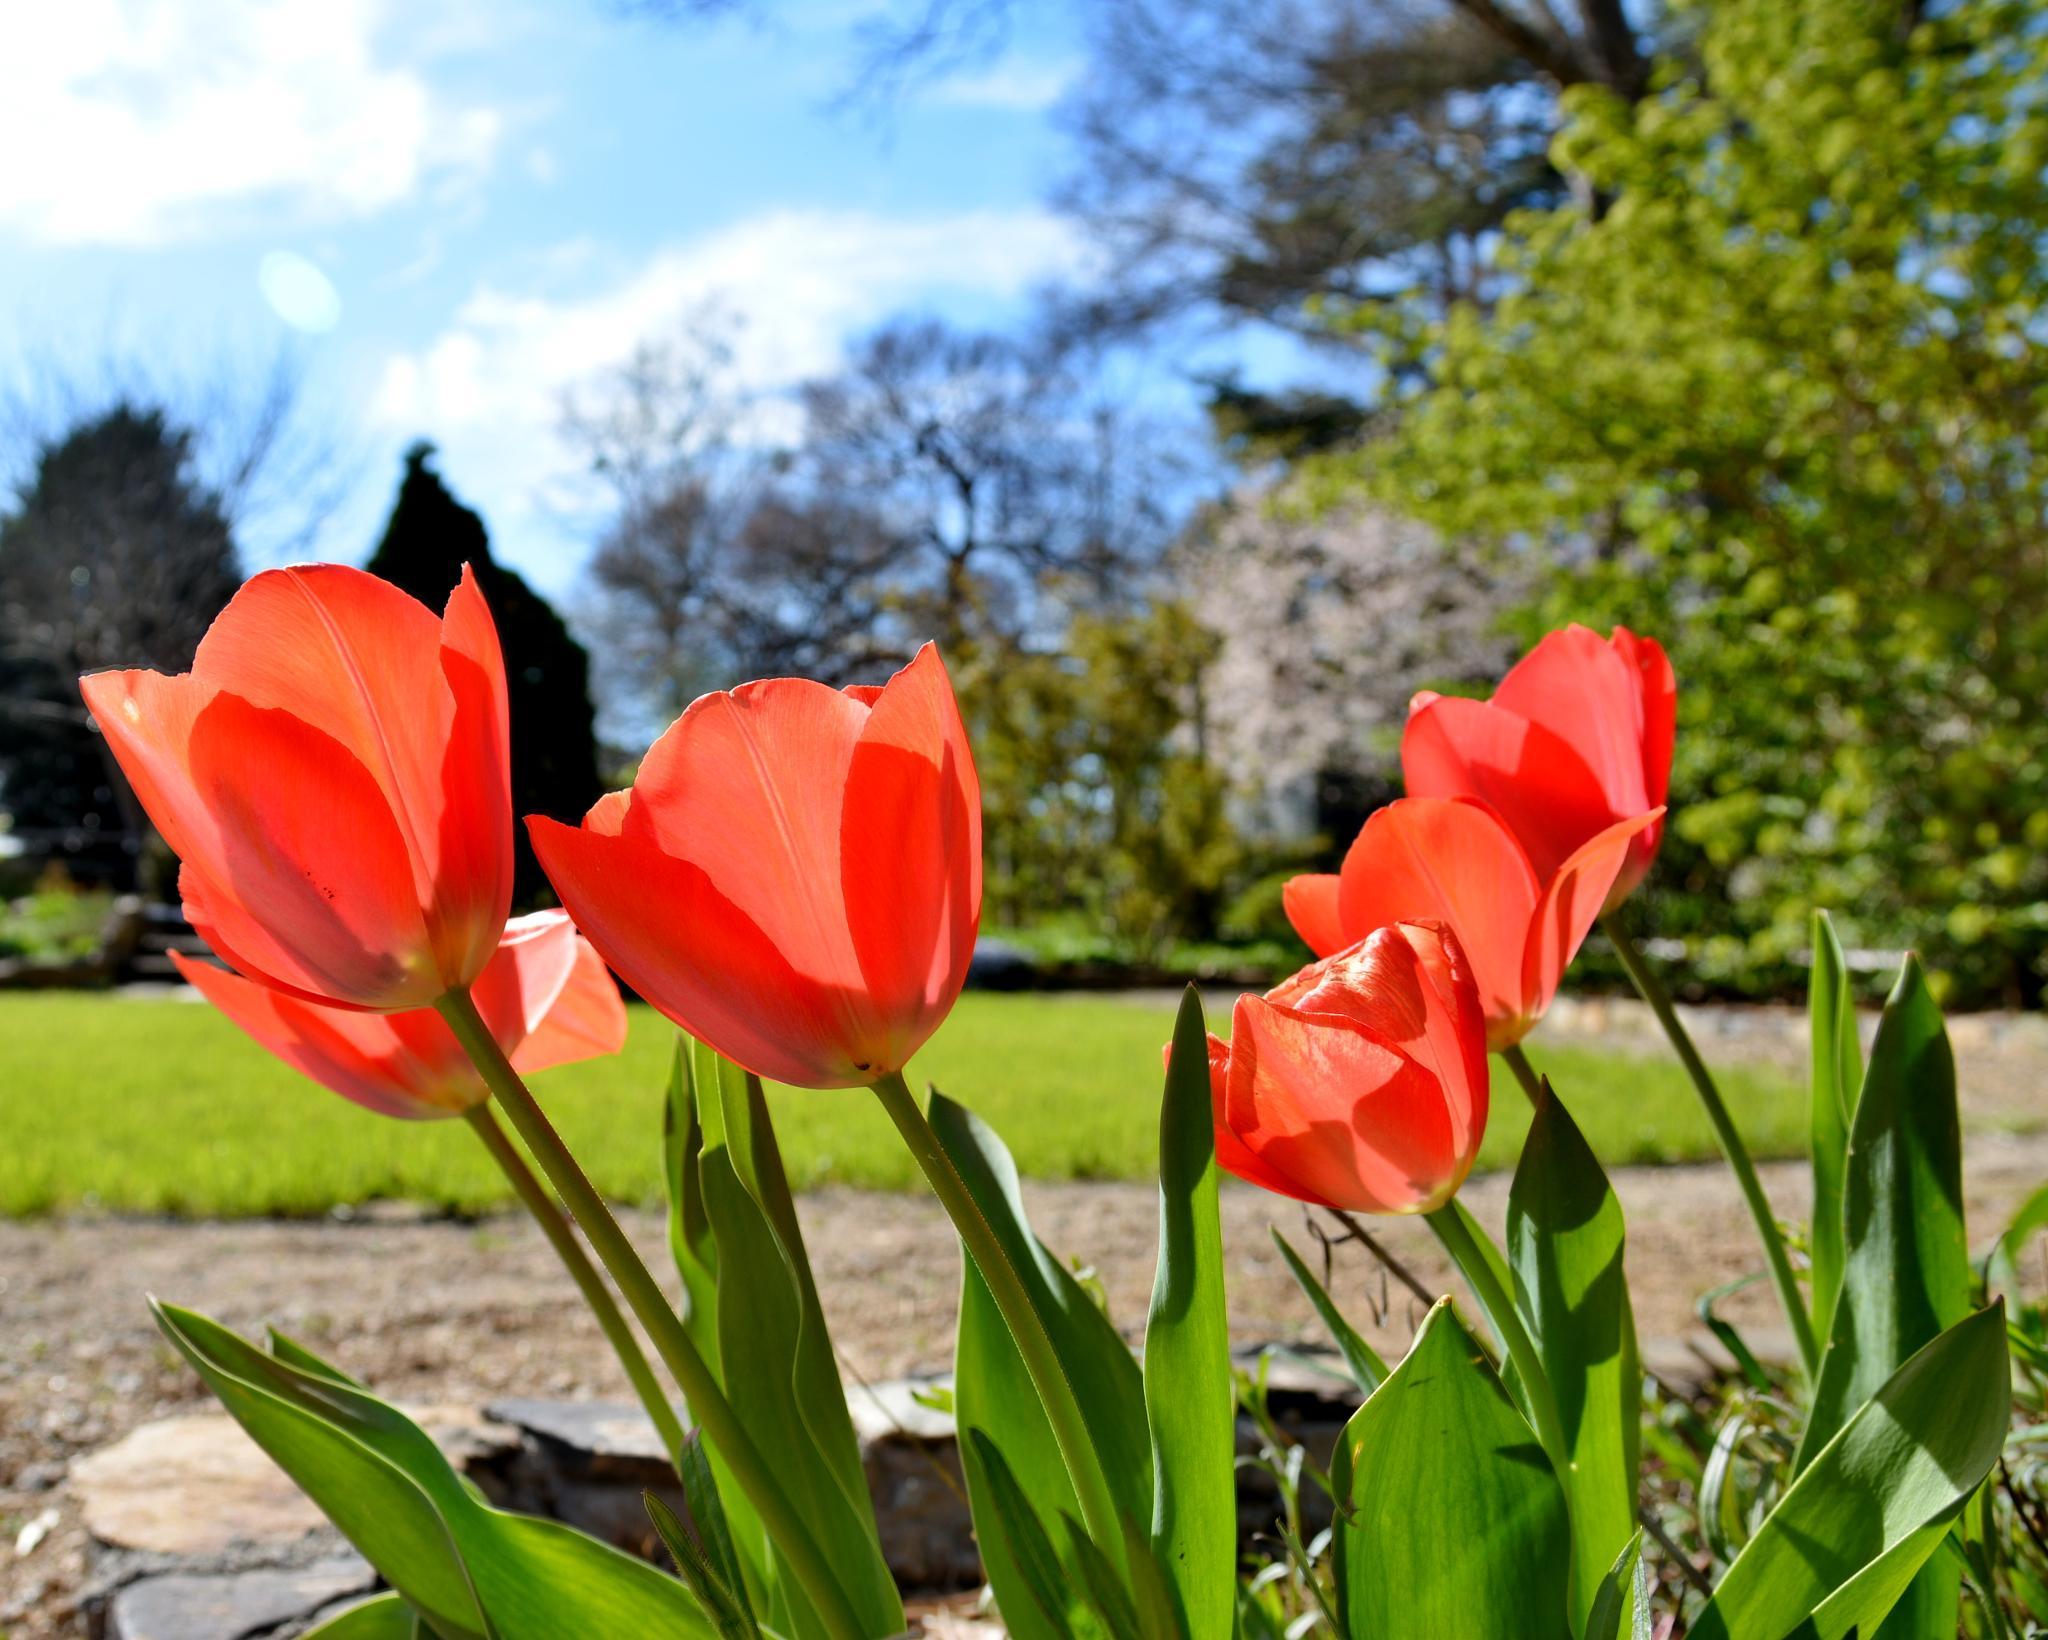 Tulip Garden by Cherie Steele